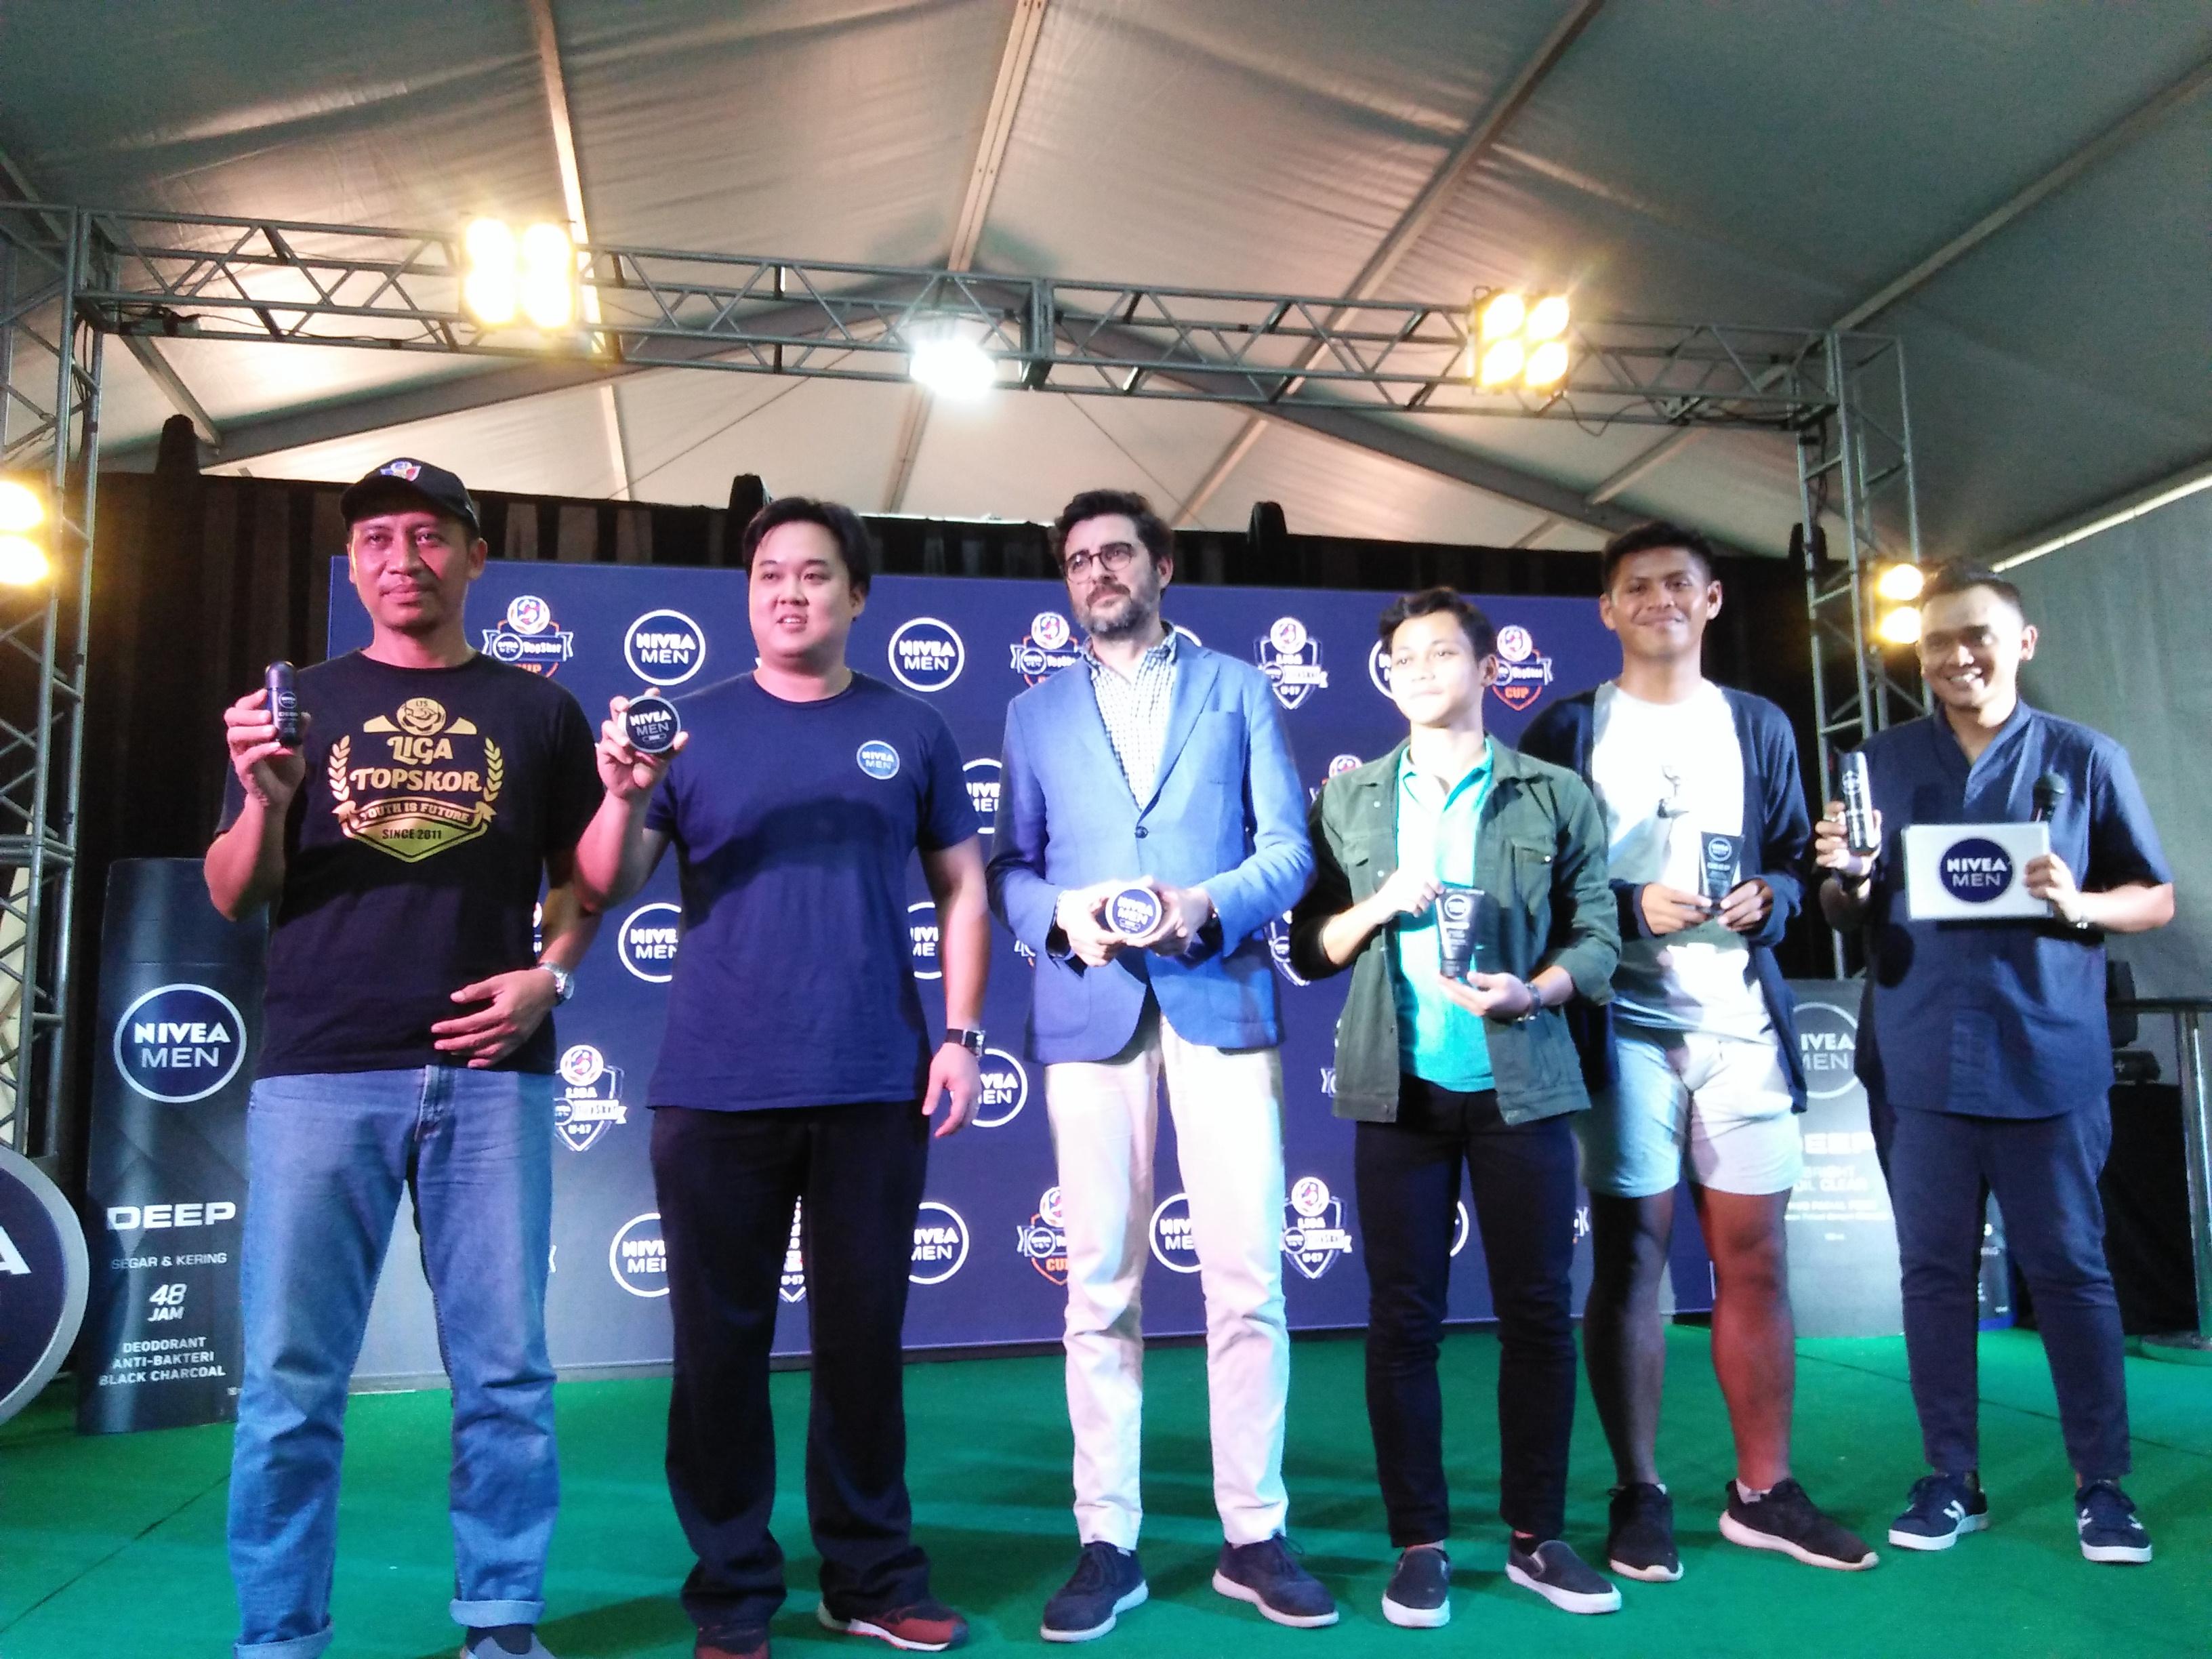 Liga Nivea Men Sukses Digelar di Jakarta